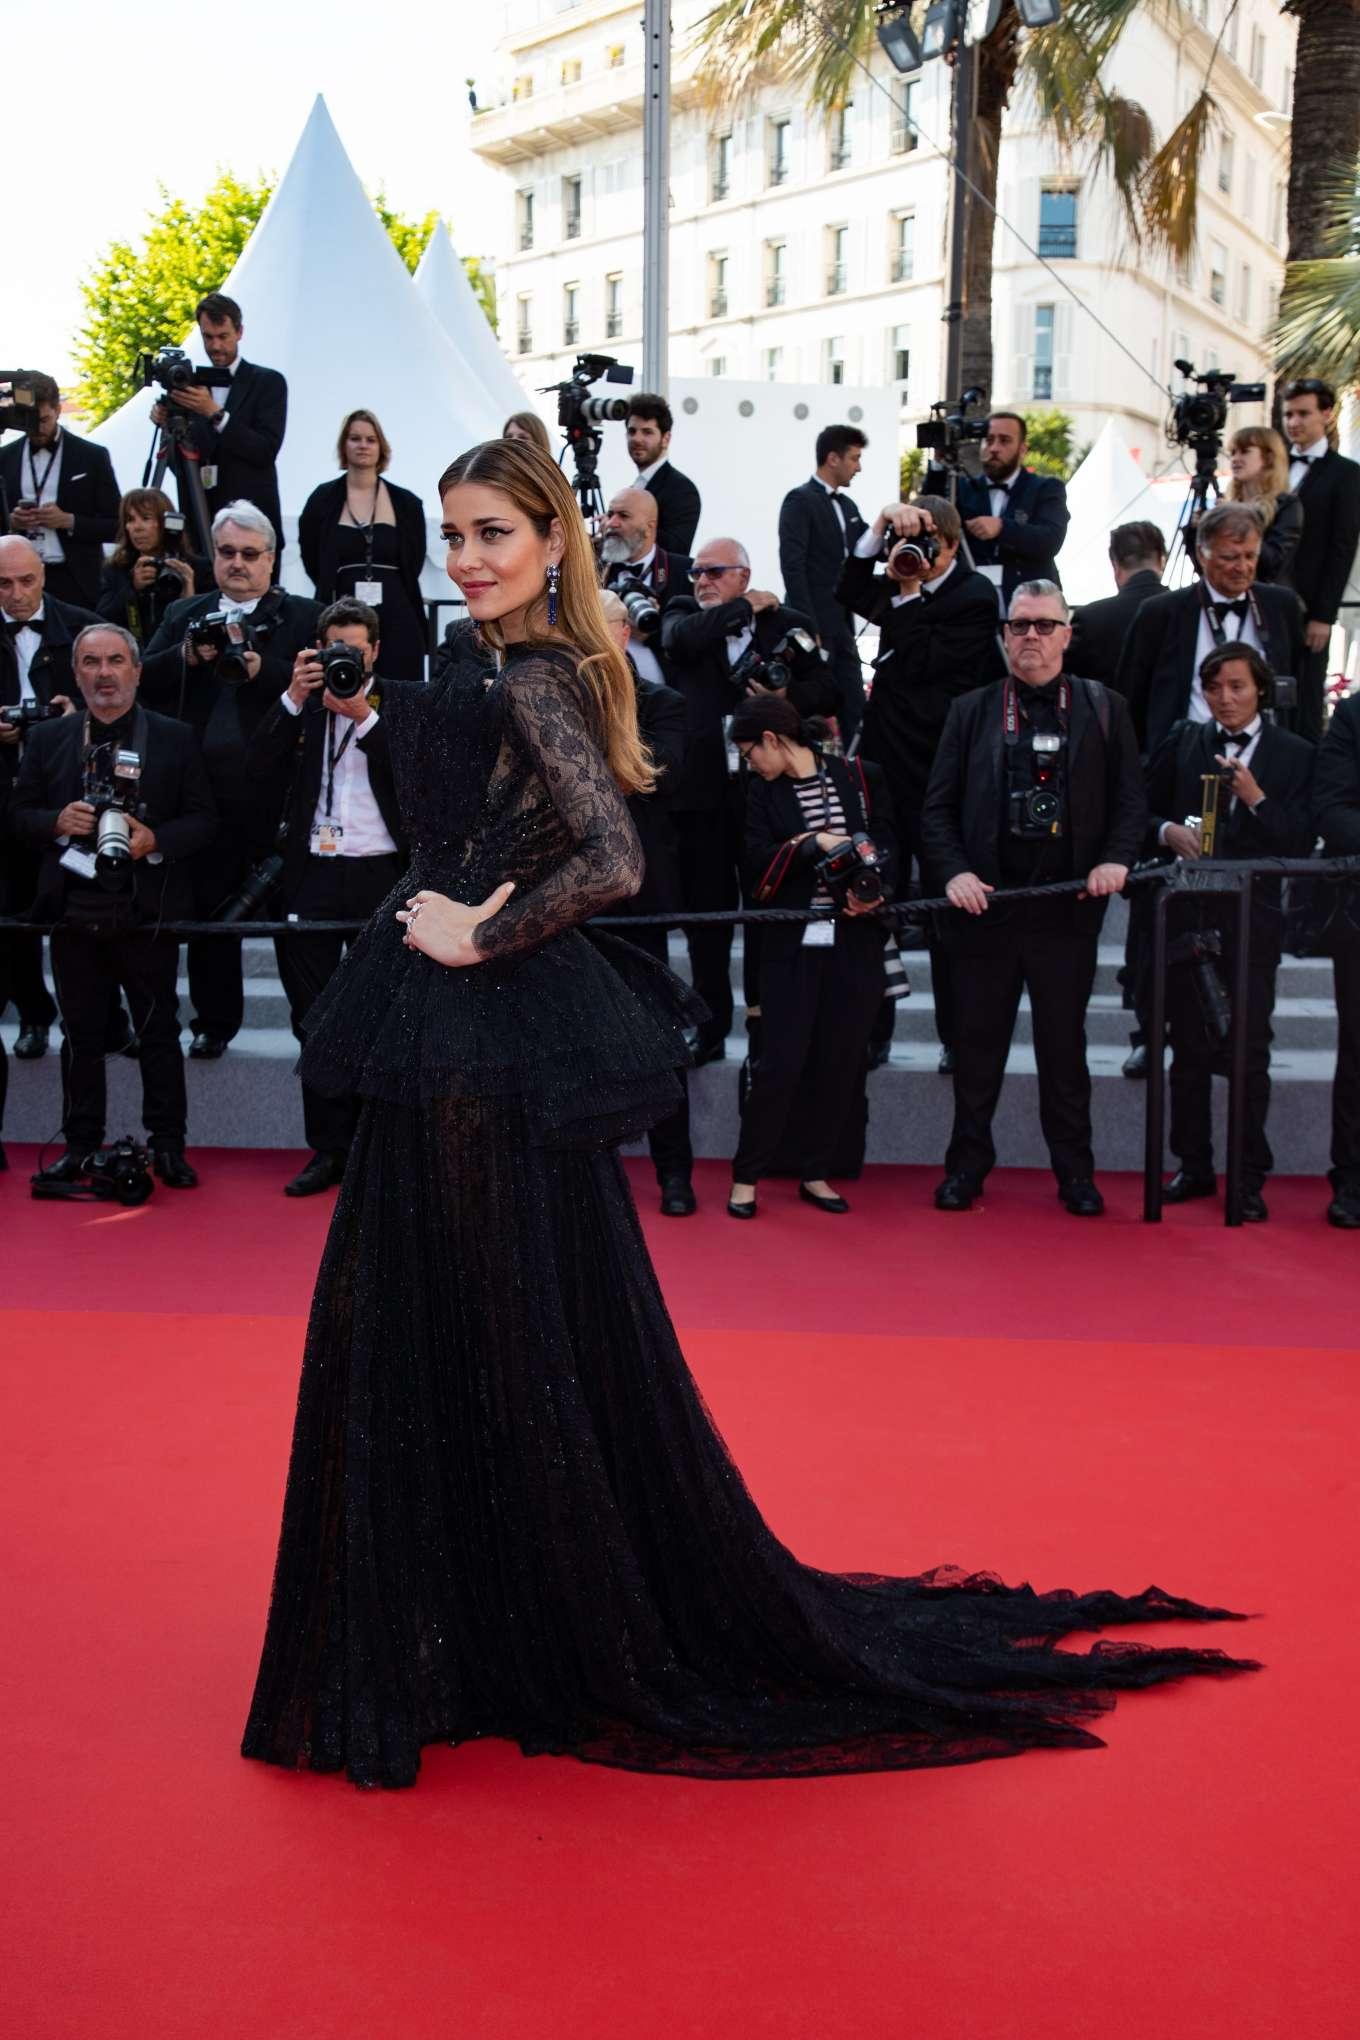 Ana Beatriz Barros 2019 : Ana Beatriz Barros: The Traitor Premiere at 2019 Cannes Film Festival-13